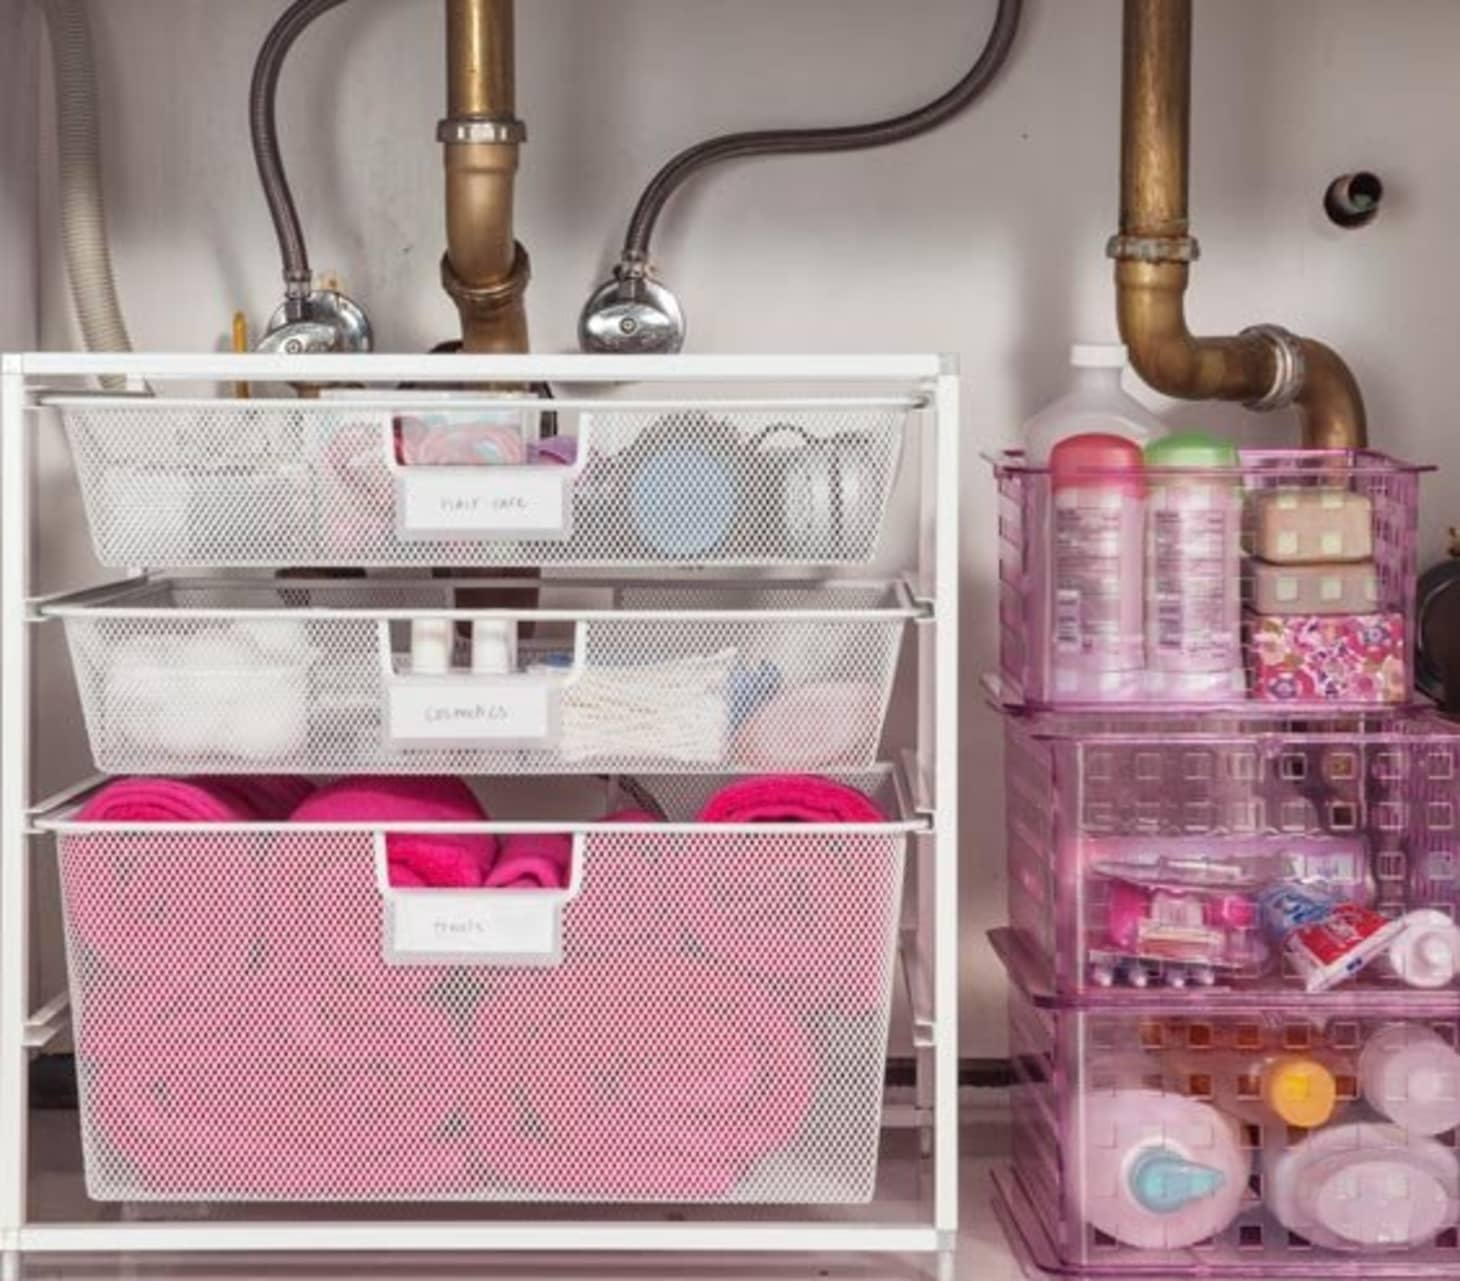 Bathroom Storage Ideas - Storage For Small Bathrooms ... on Small Apartment Bathroom Storage Ideas  id=73257